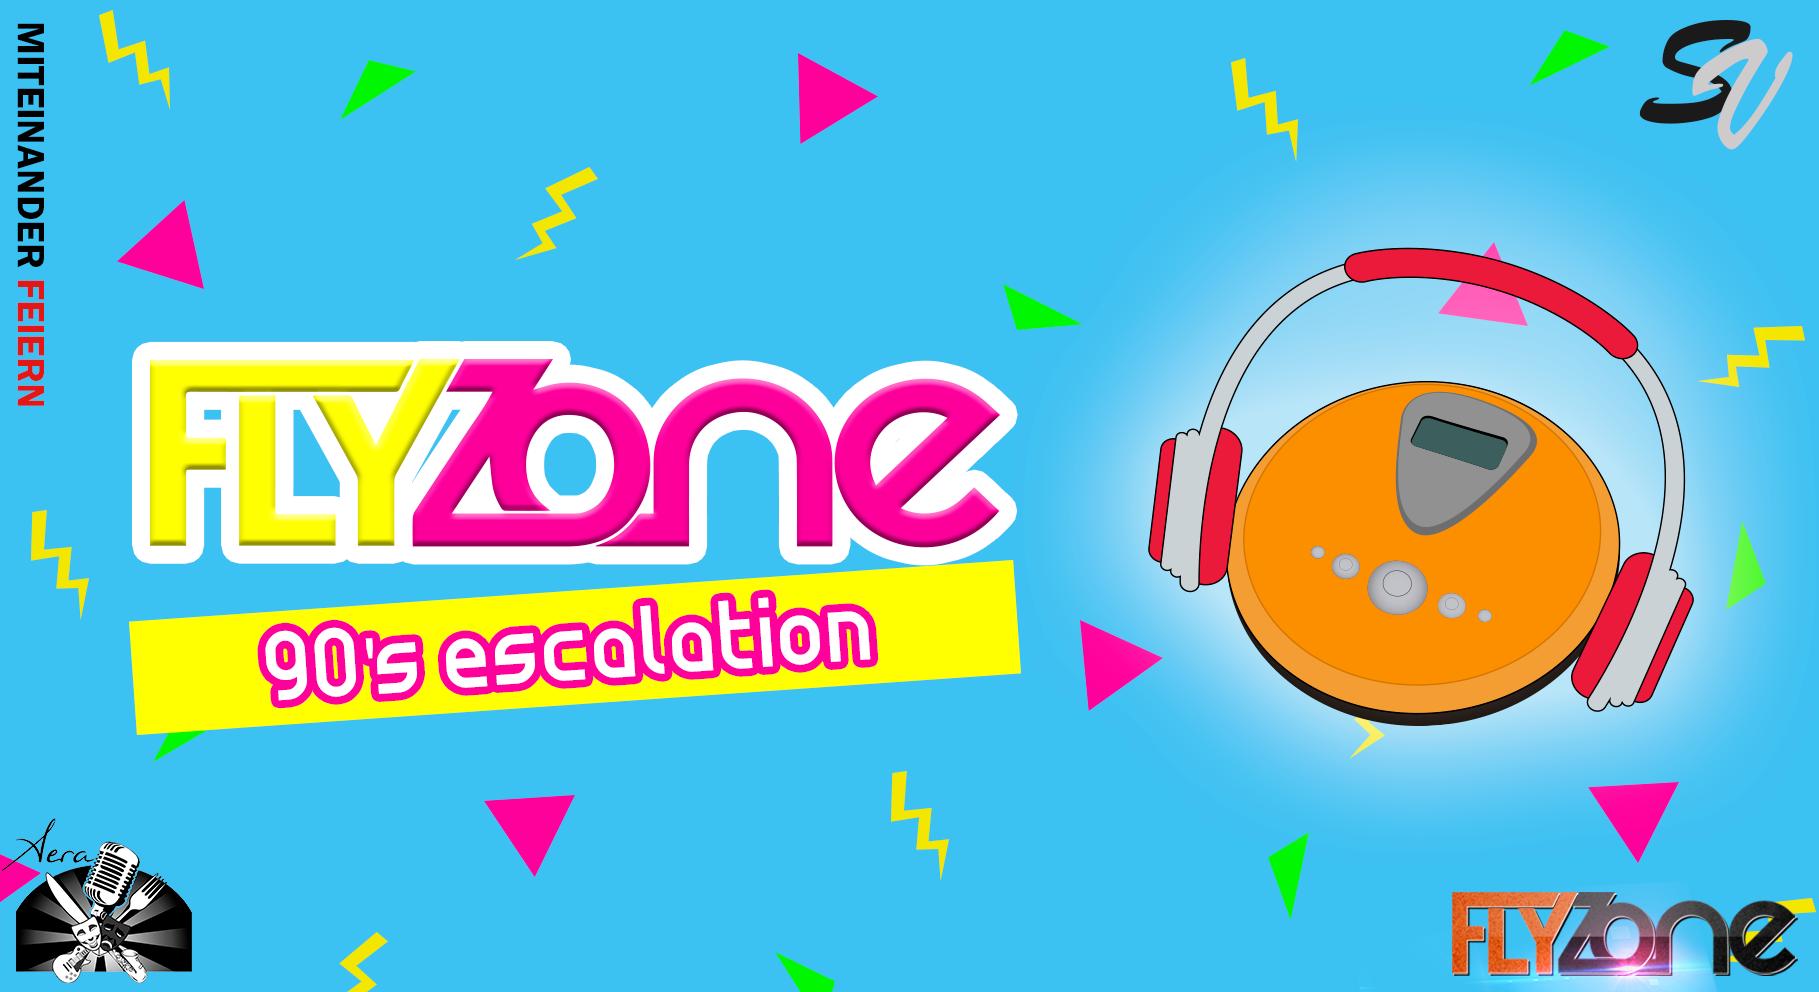 FLYzone – 90s escalation am 1. February 2020 @ Aera.